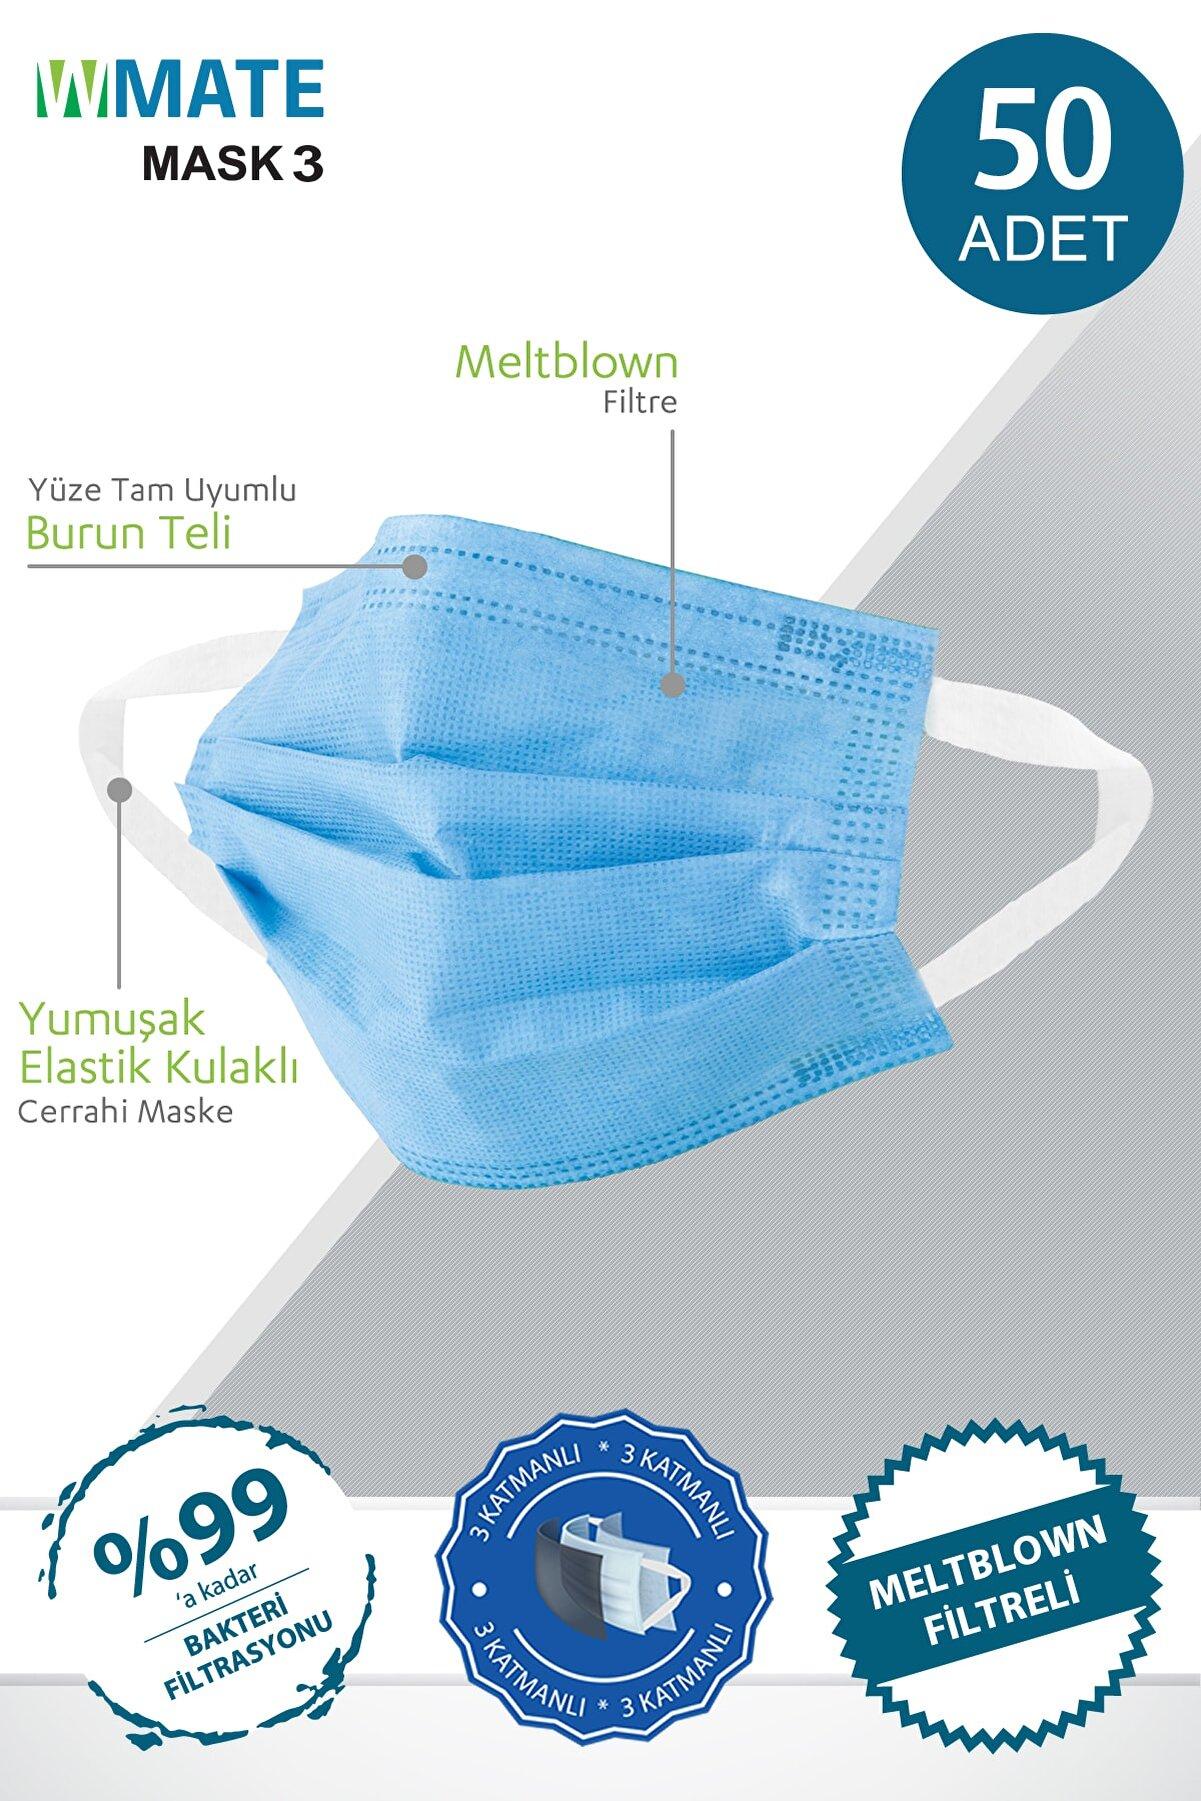 WMATE MASK3 50 Adet Turkuaz Mavi Meltblown Filtreli 3 Katlı Yeni Nesil Maske 10'lu Özel Poşet